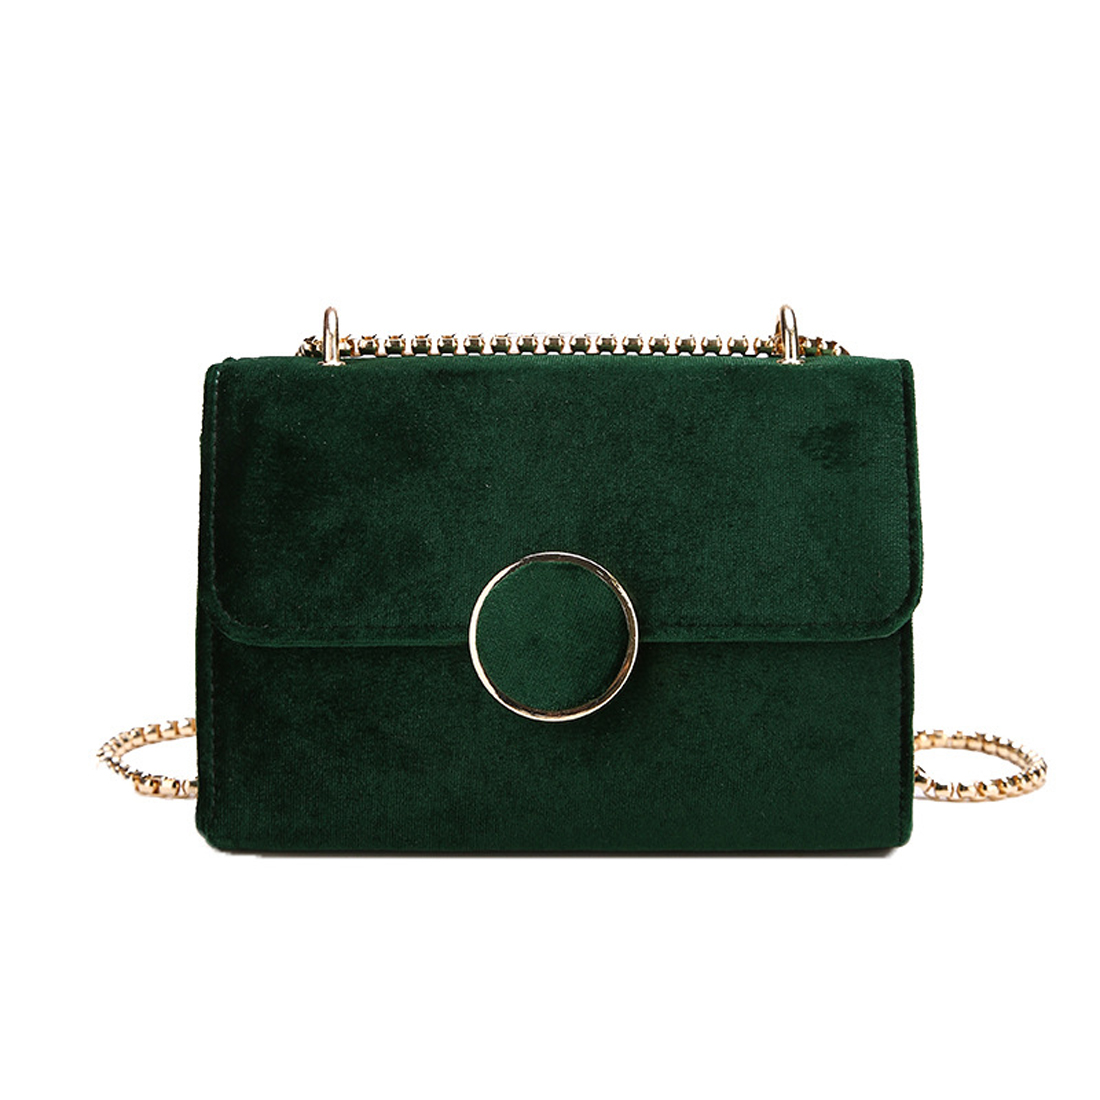 New style Woman Velour Shoulder Bag Female Vintage Mini Flap Bag Small Chain Quilted Famous Brand Designer Handbag